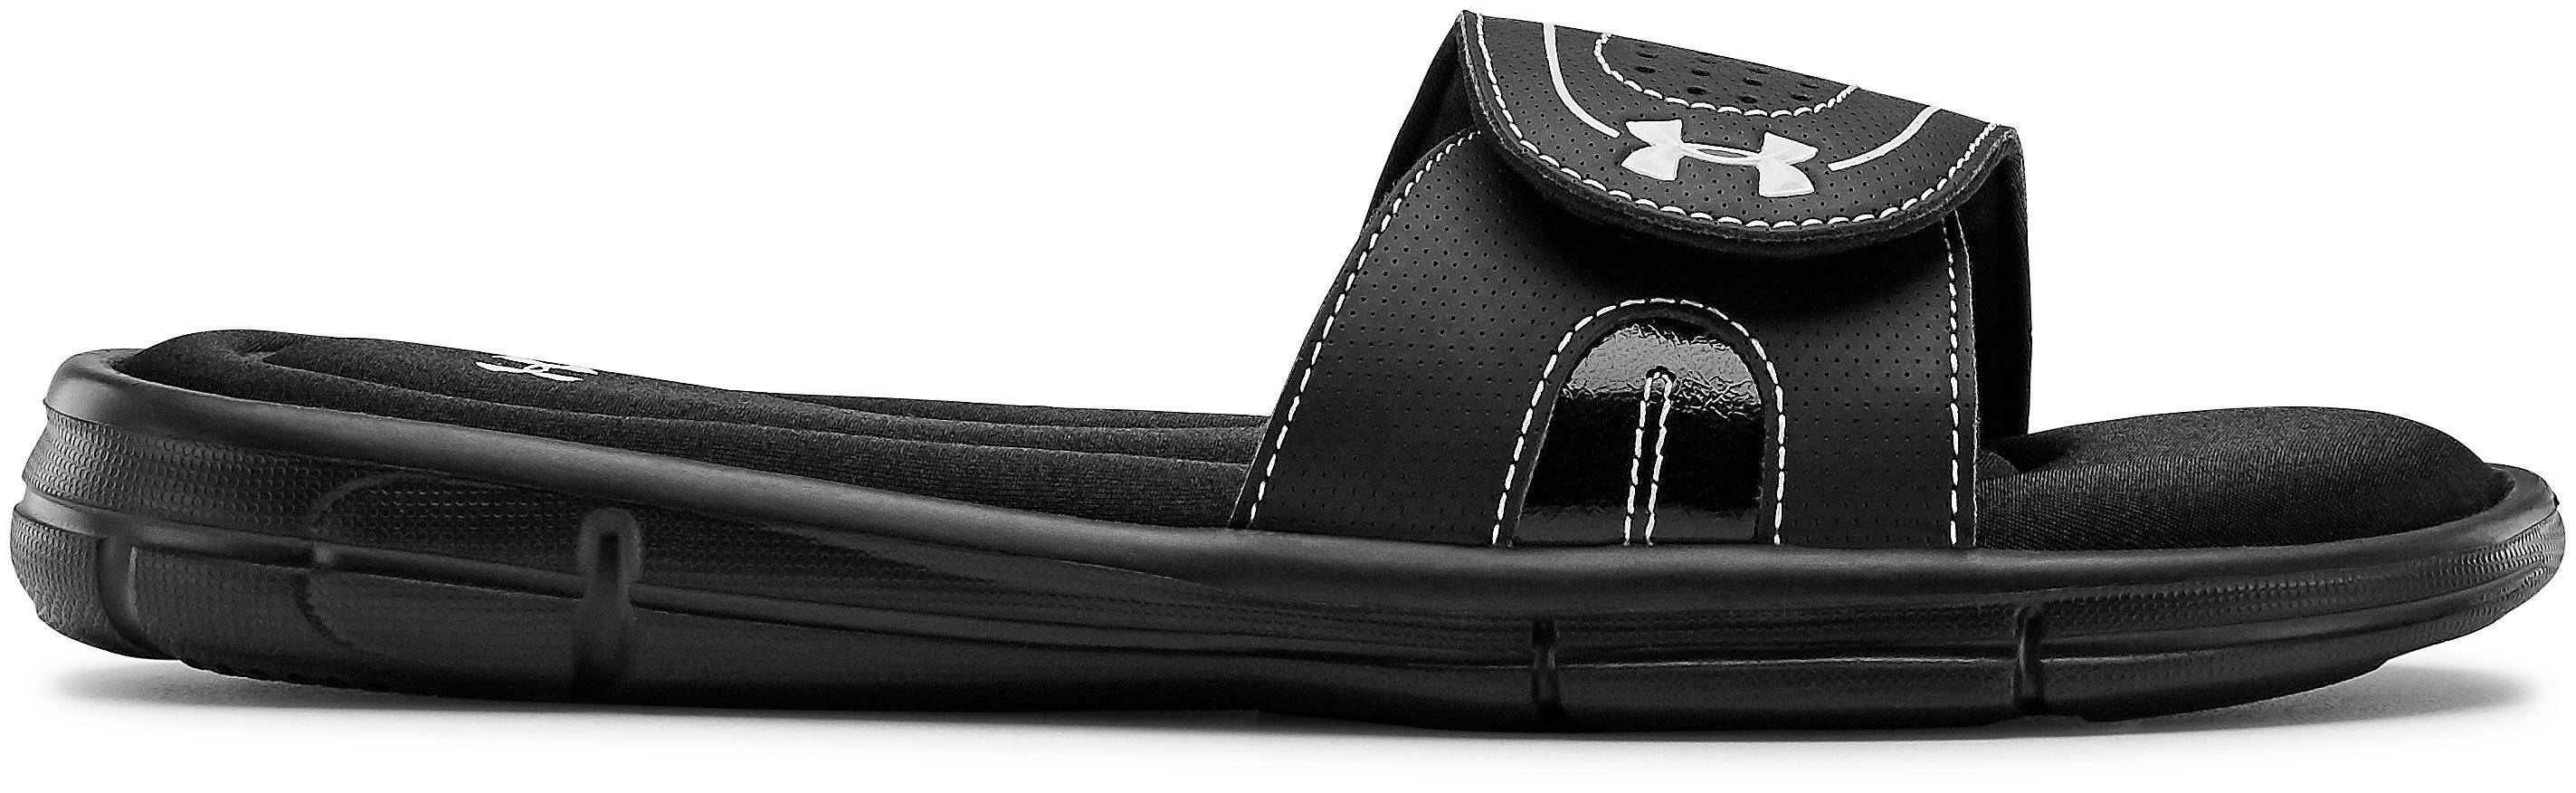 Sandal UA Ignite VIII Slides untuk Wanita, 360 degree view